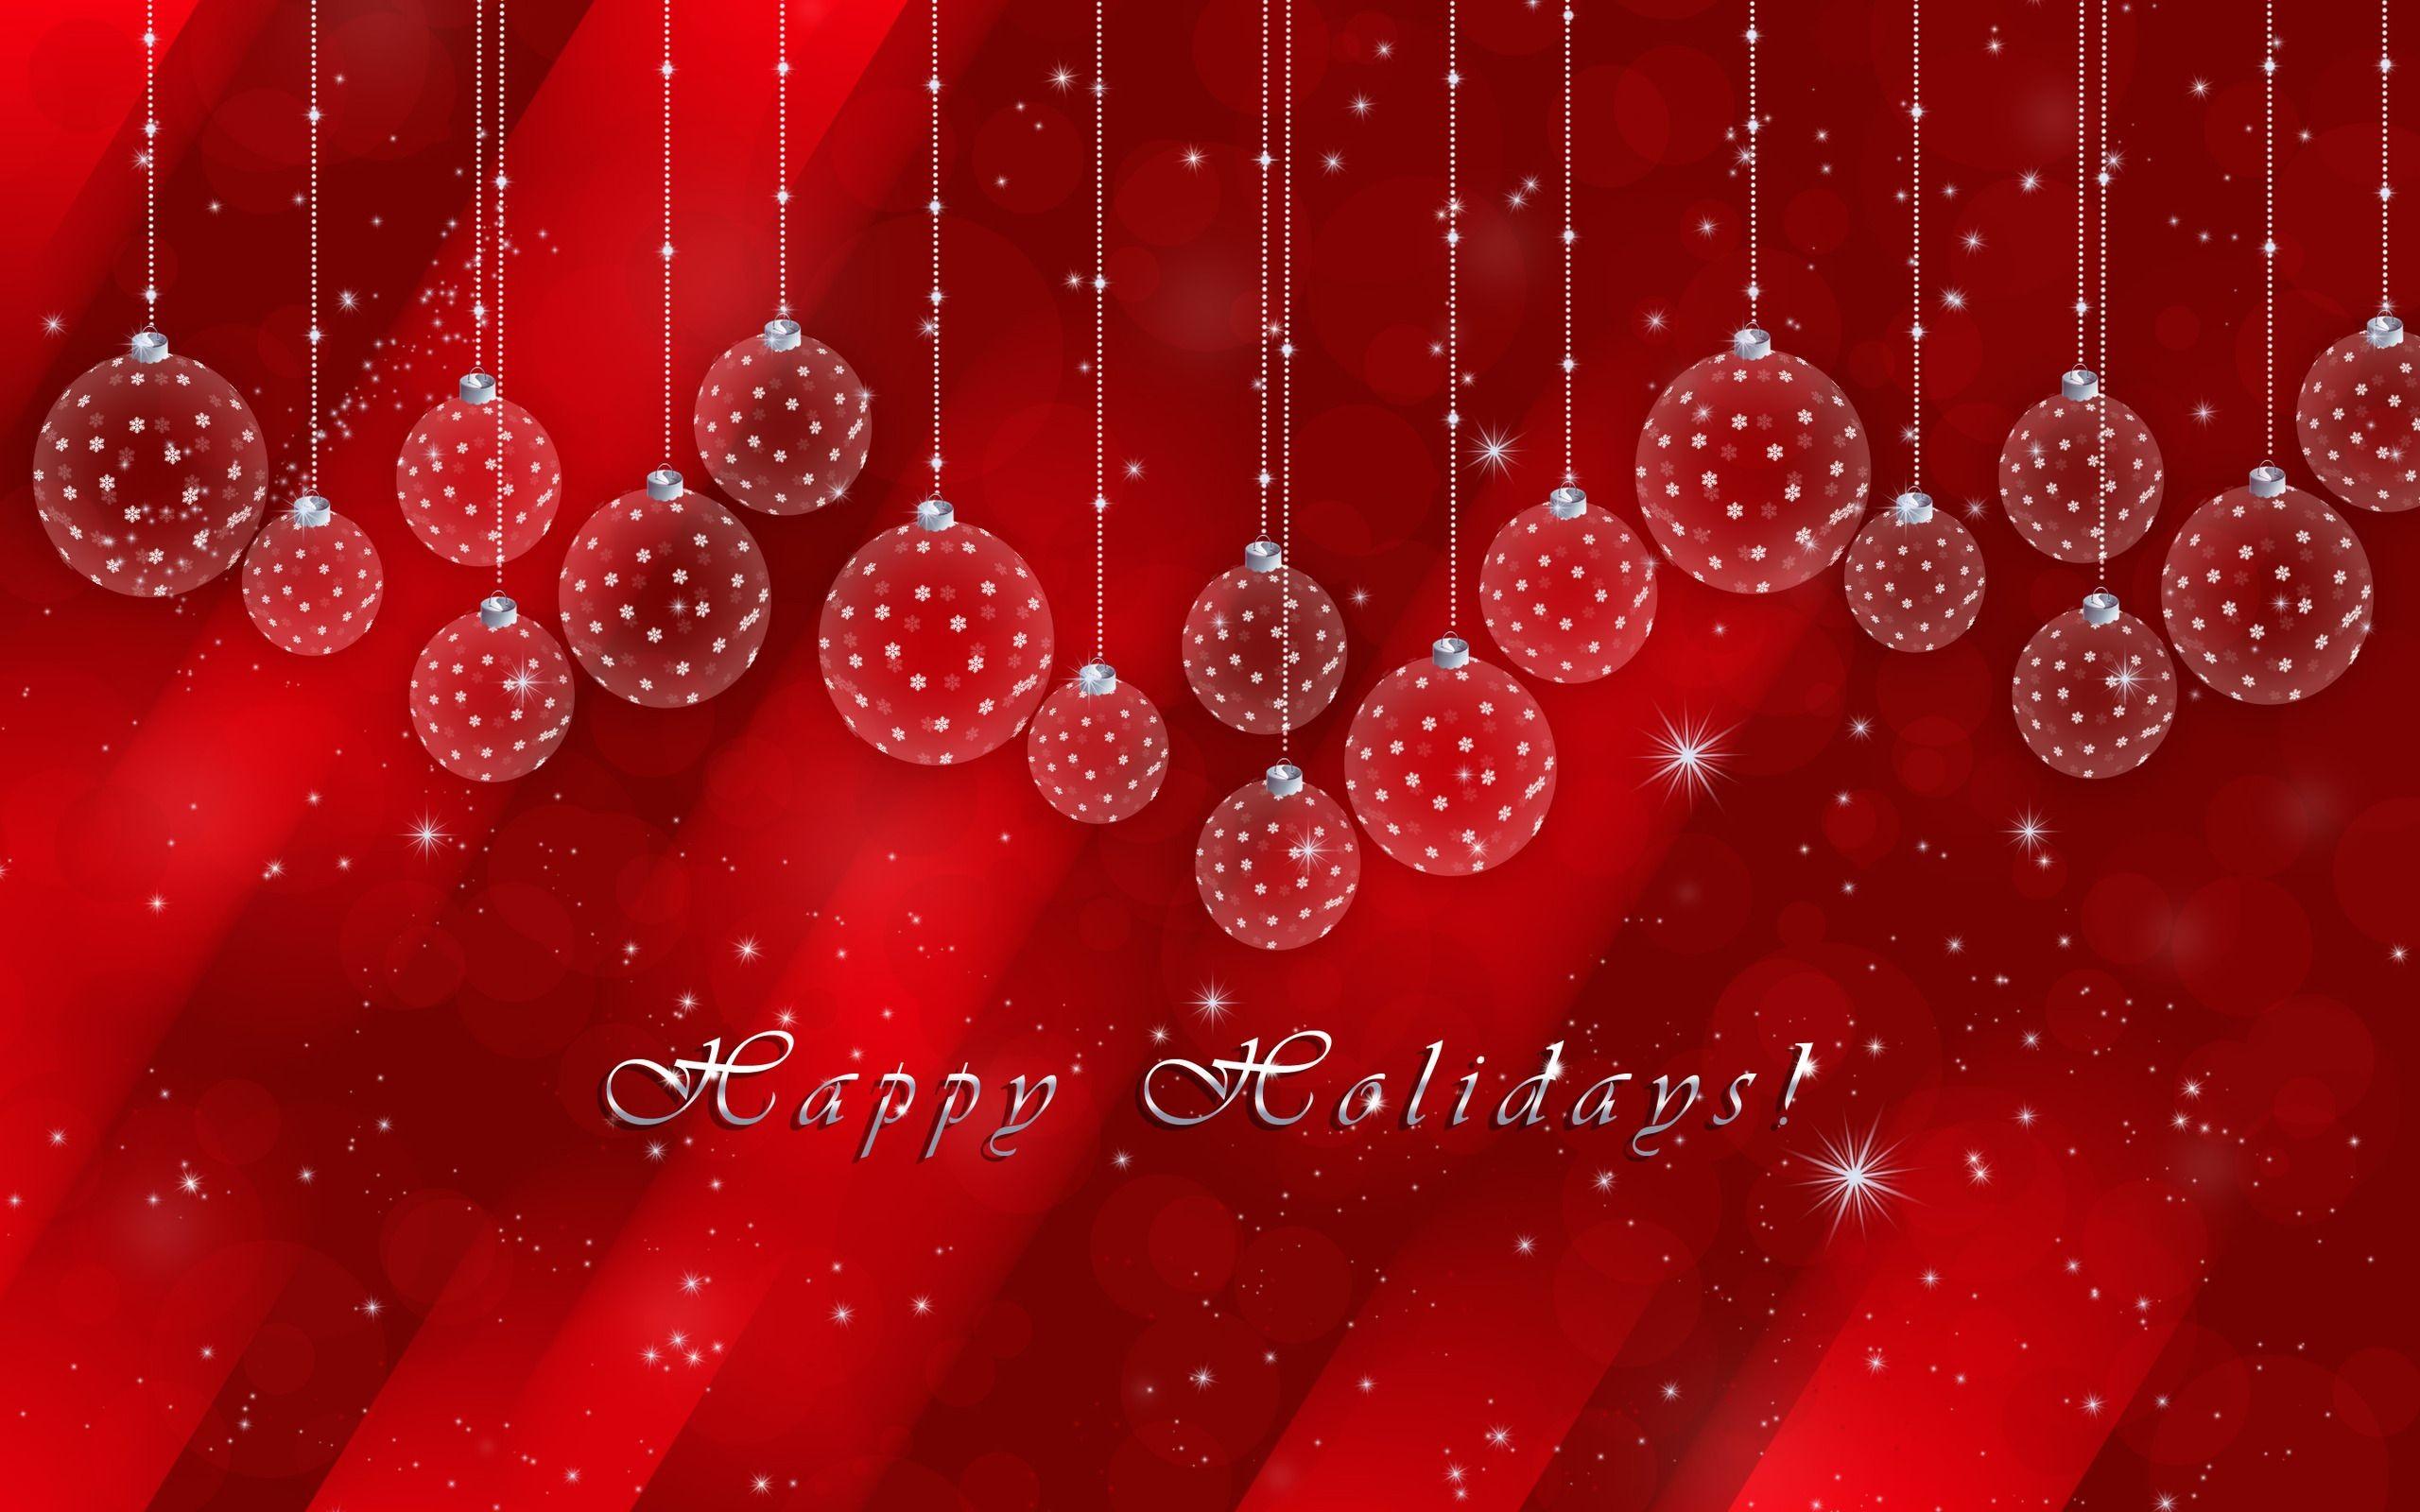 Download Happy Holiday Hd Wallpaper …